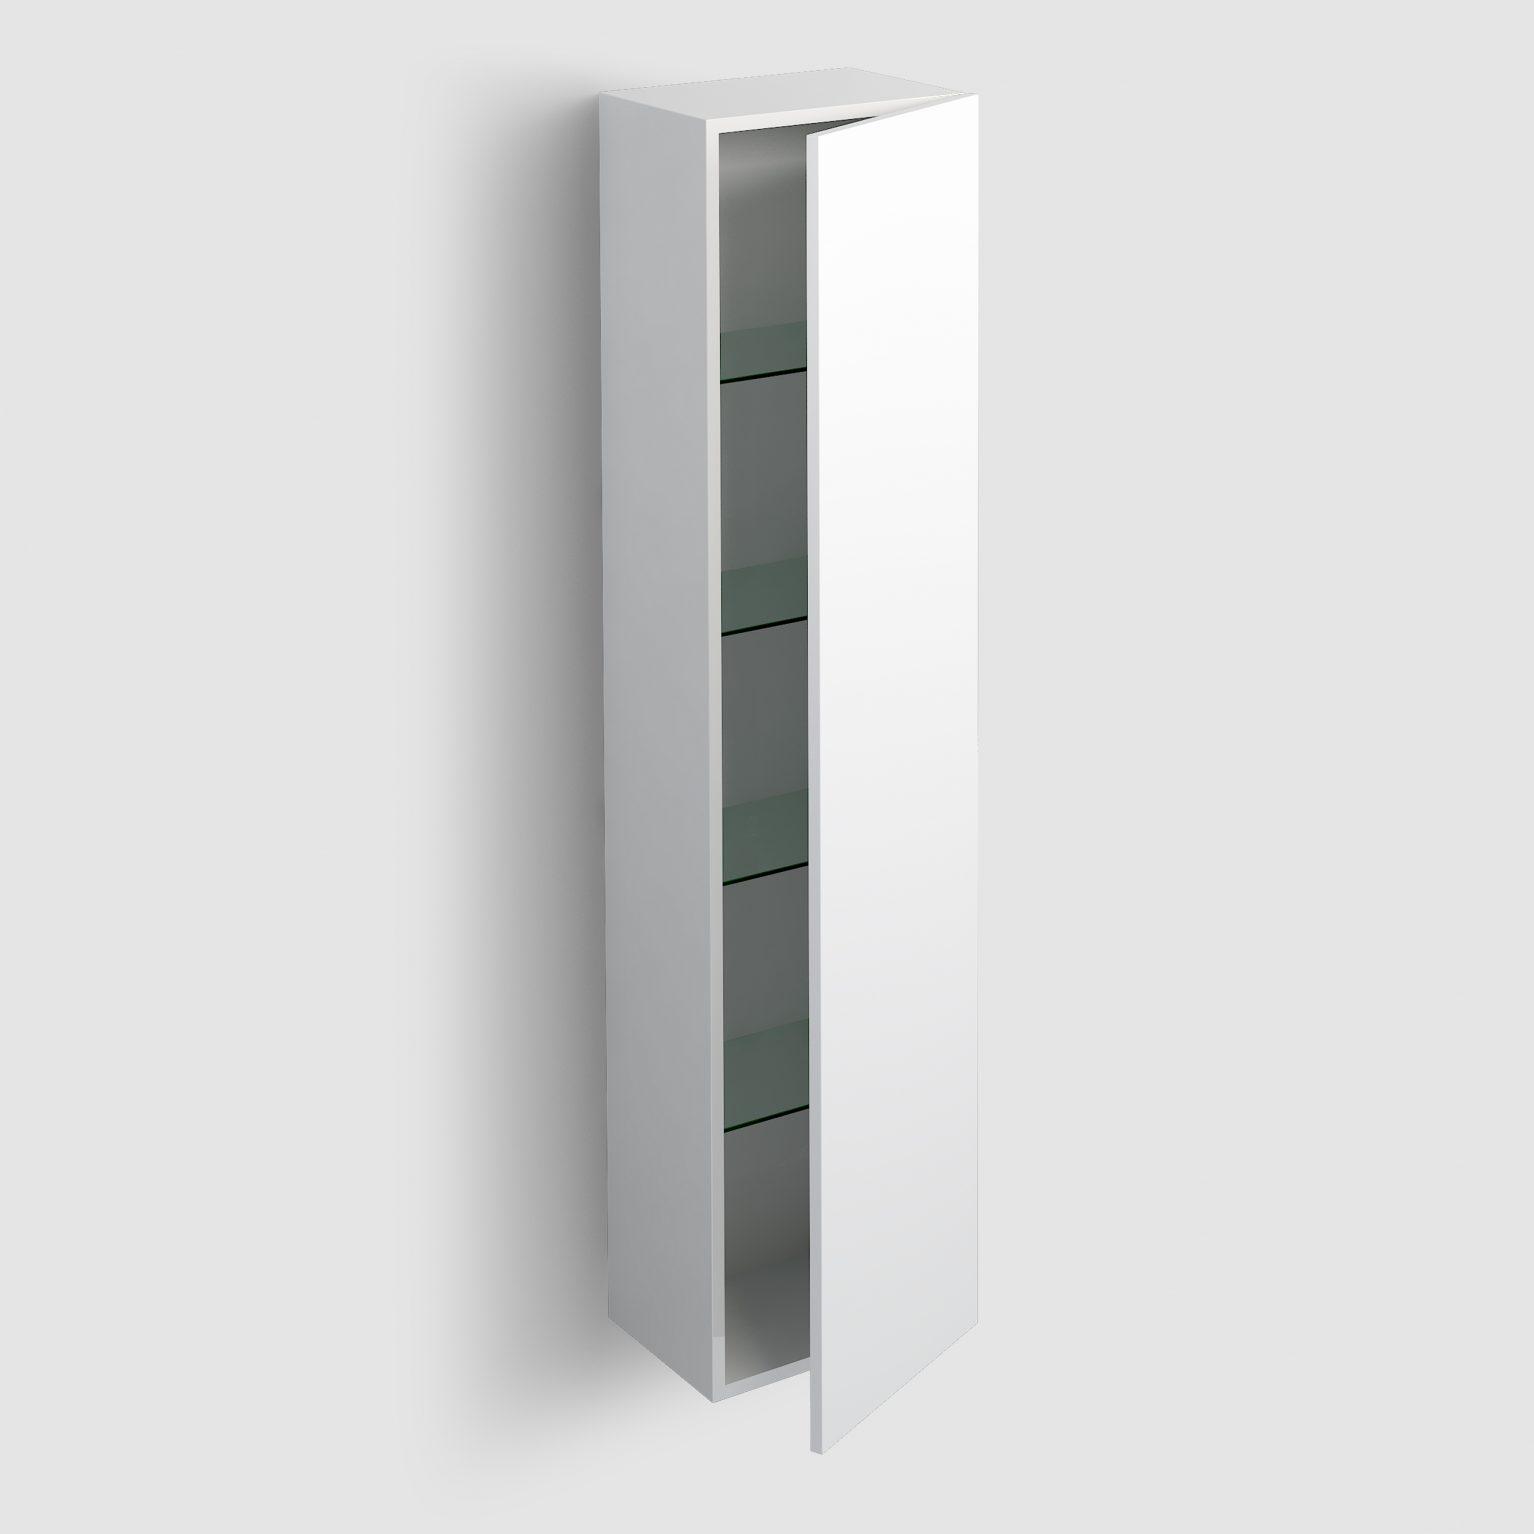 Hammock kolomkast 170cm, omkeerbaar, mat wit gelakt)